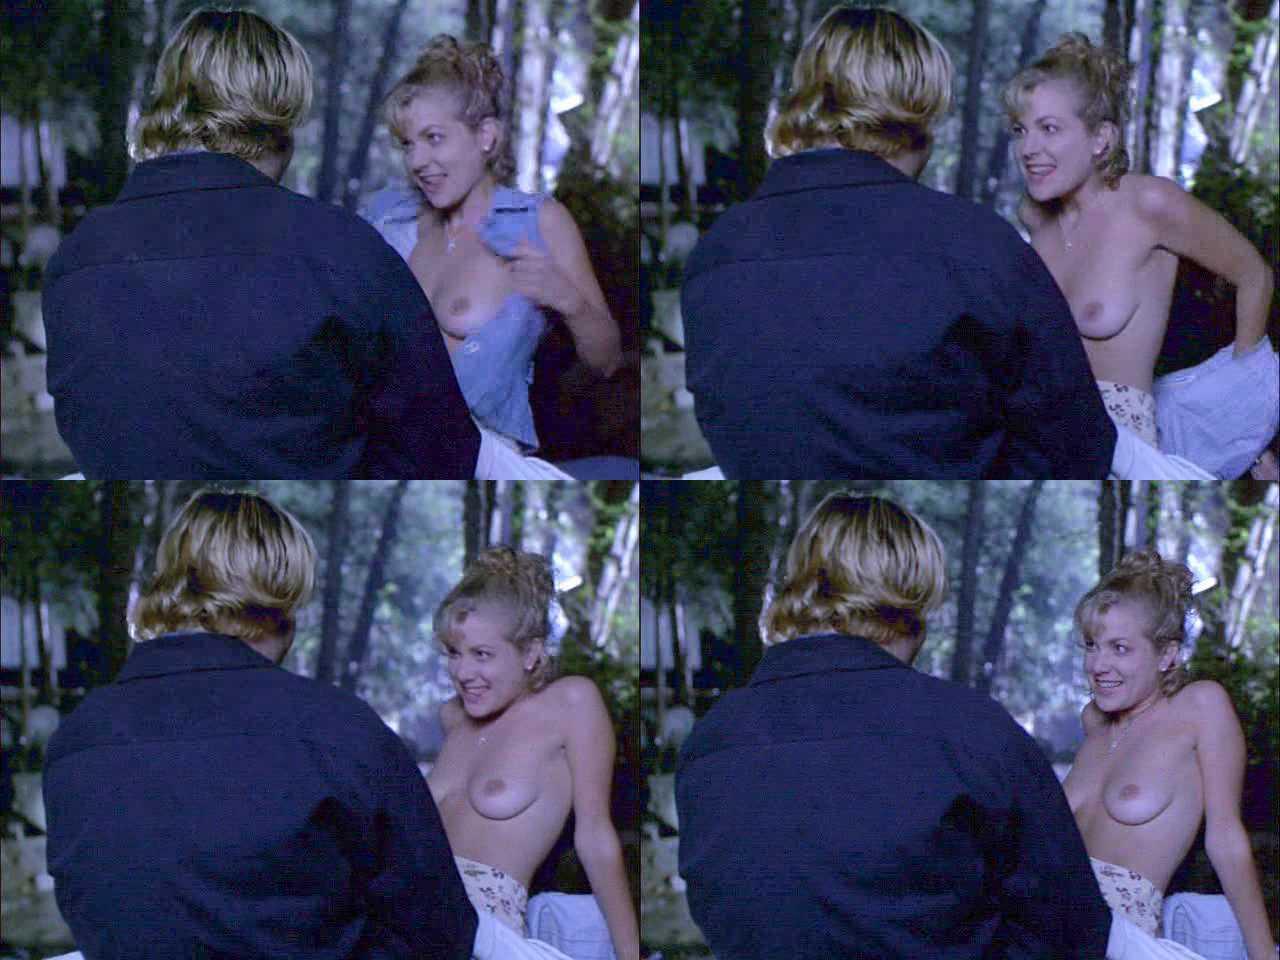 Jennifer aspen nude naked pics and sex scenes